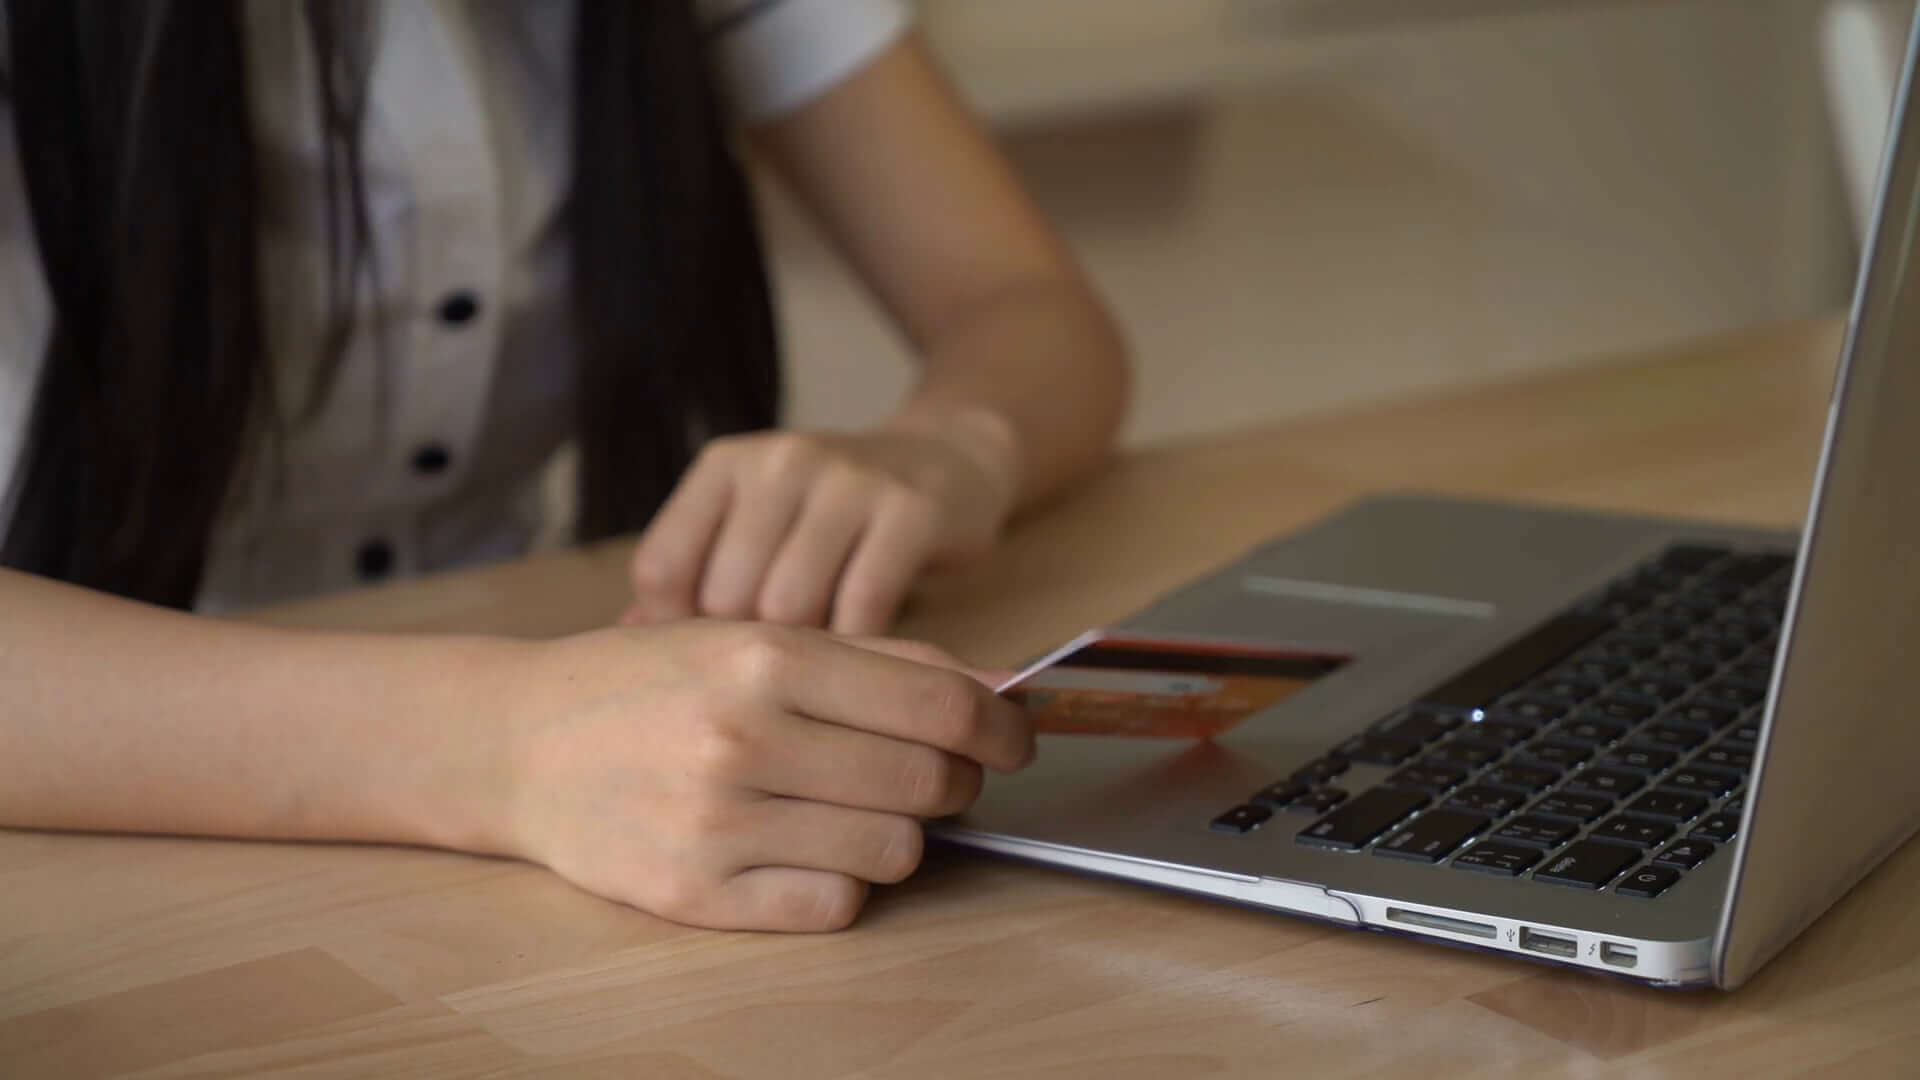 compras_online_segurança_netsegura